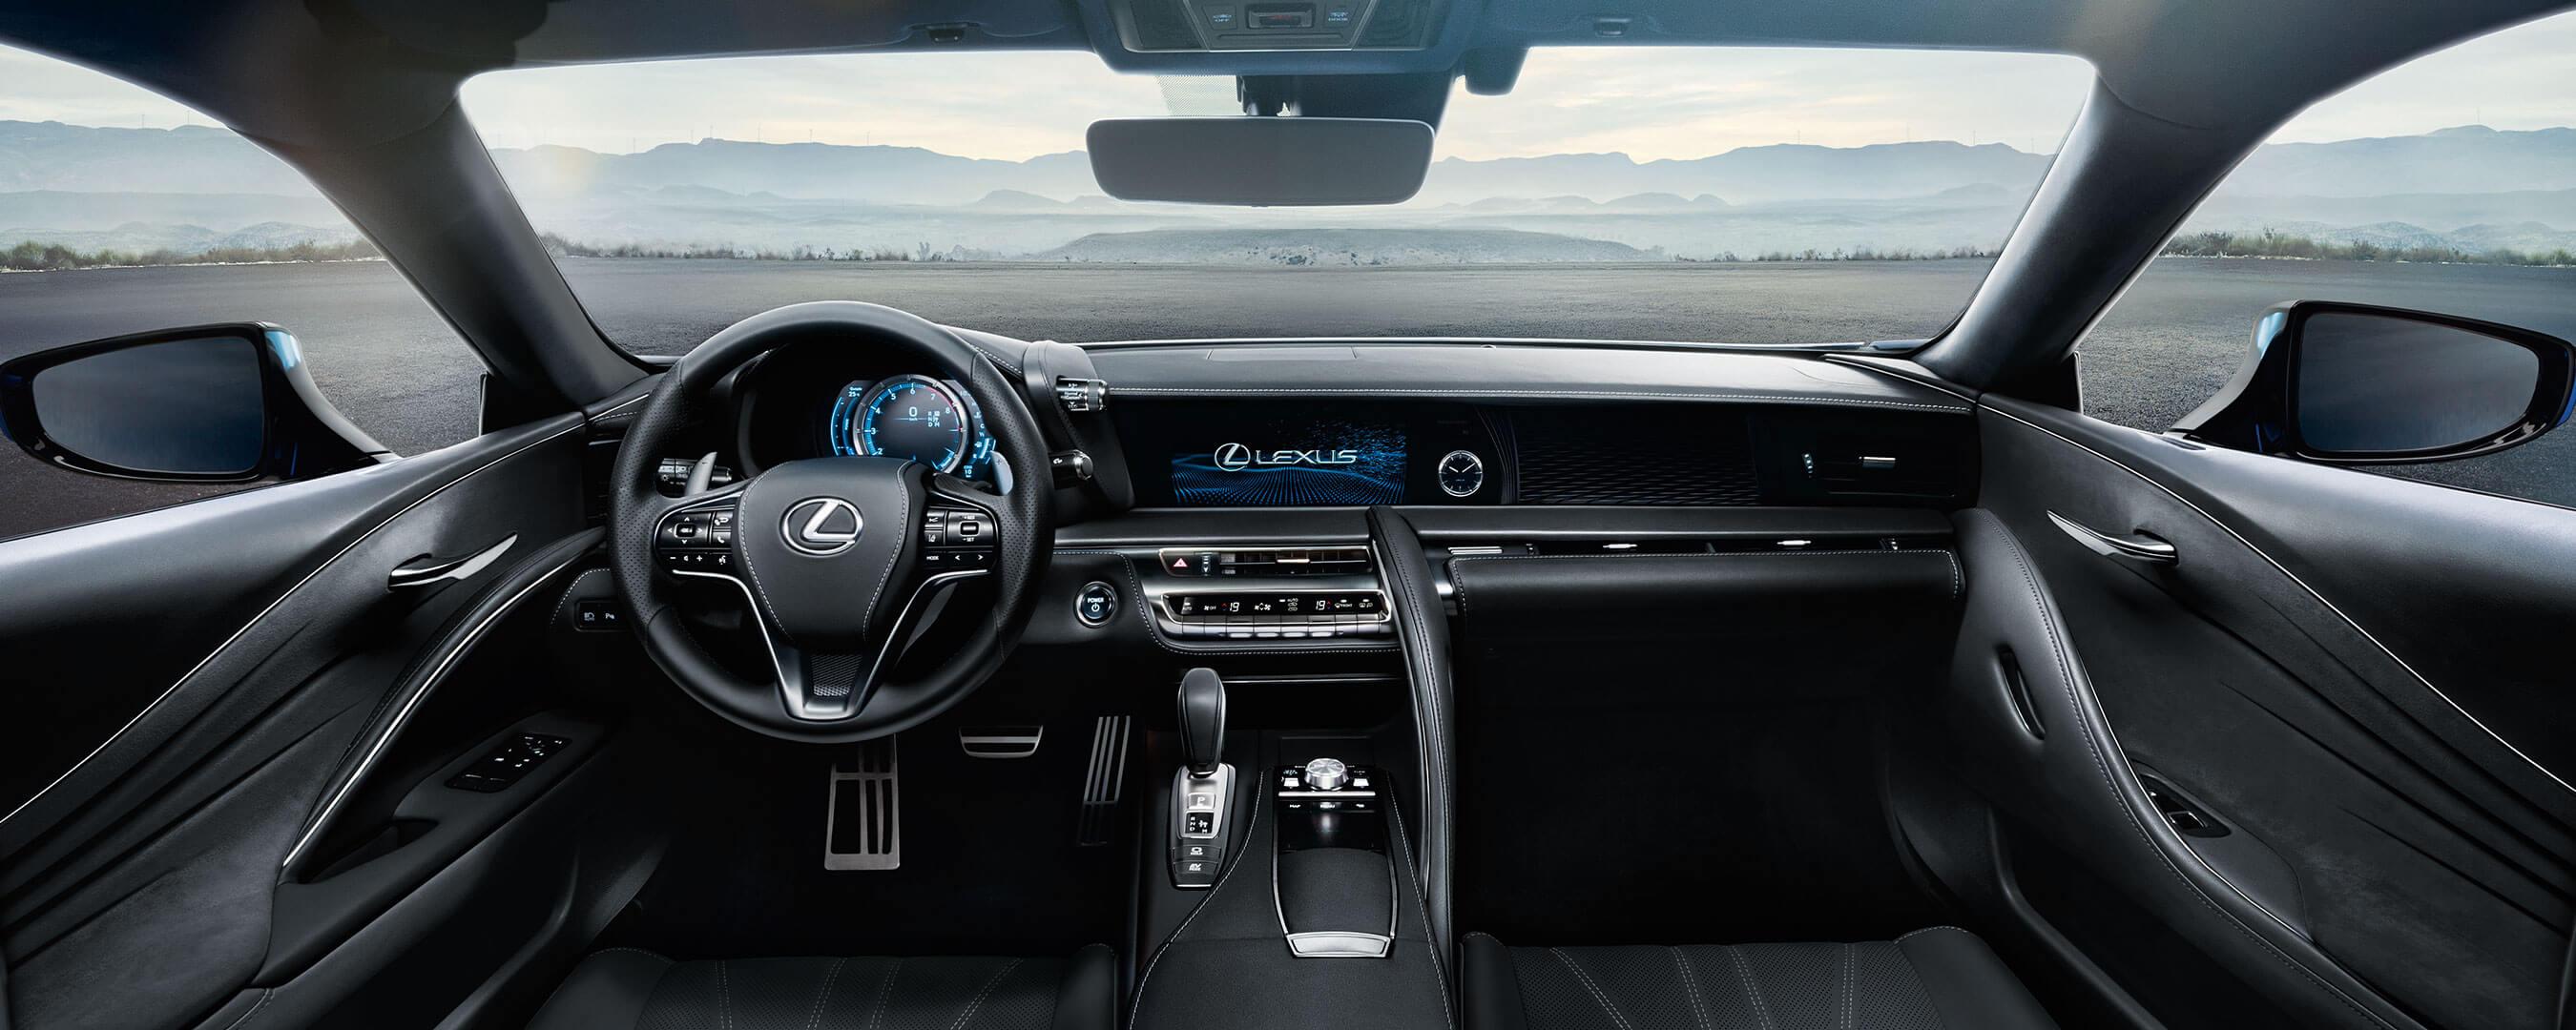 2017 lexus lc 500h experience hero interior front